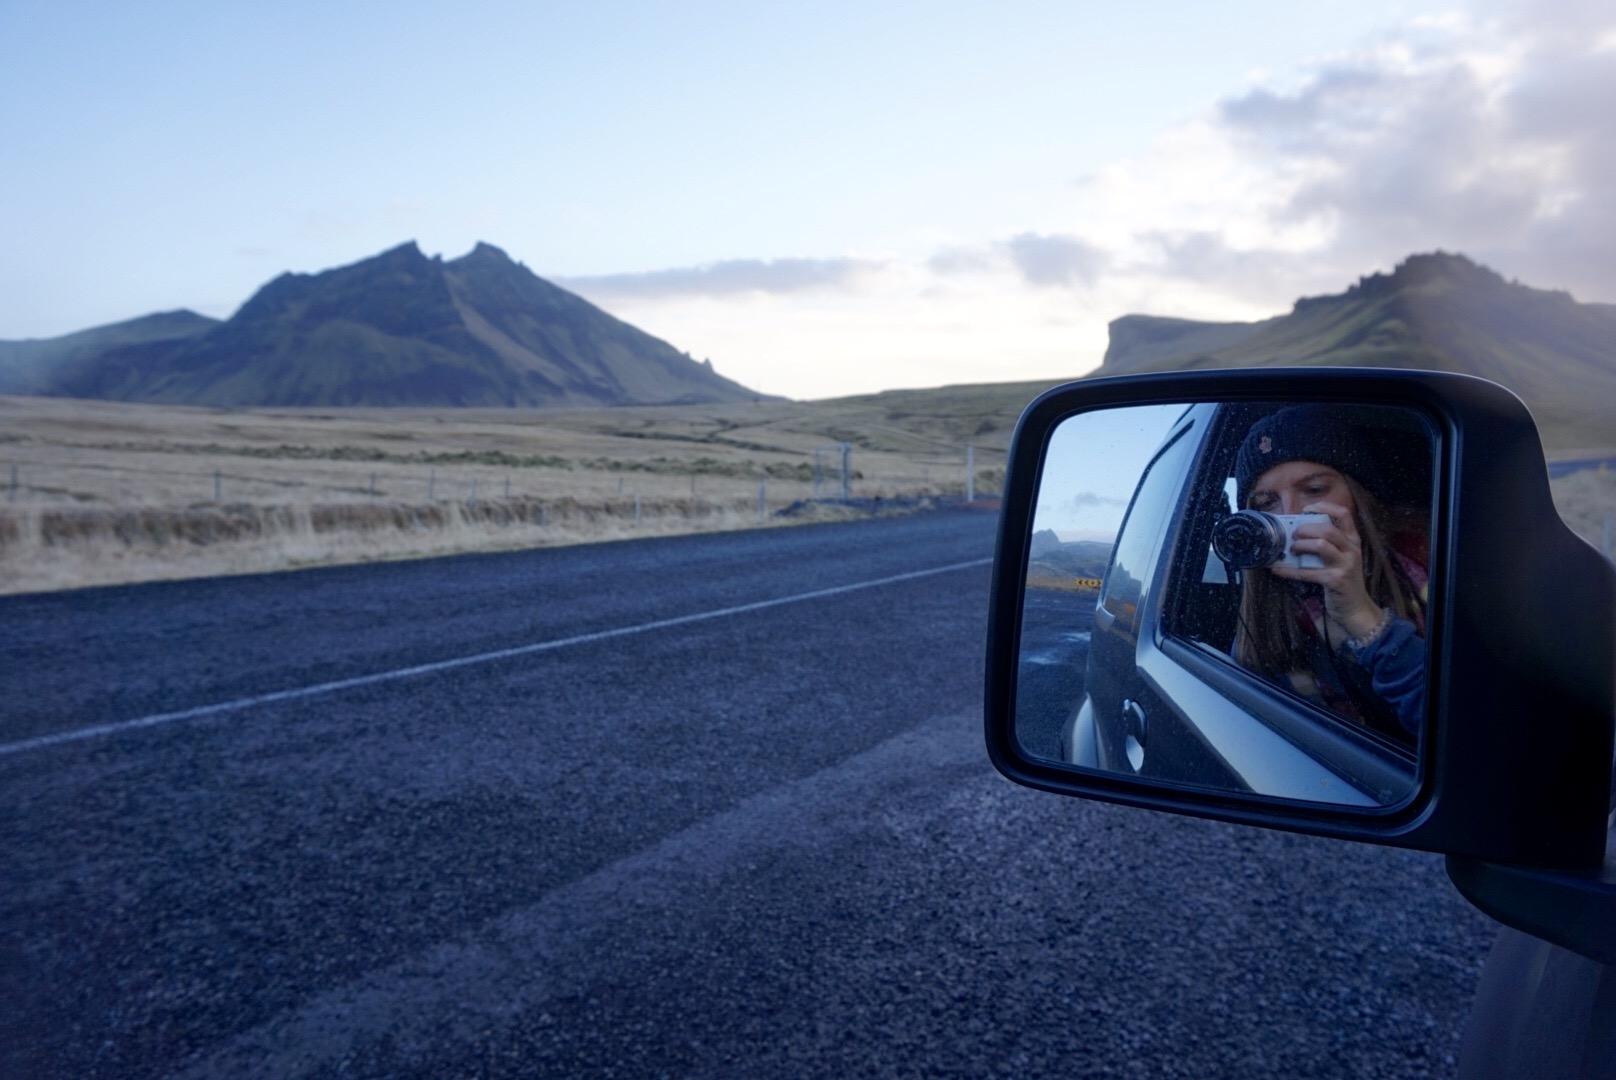 Car Rental, Route 1, Route 1 Car Rental, Iceland, Car